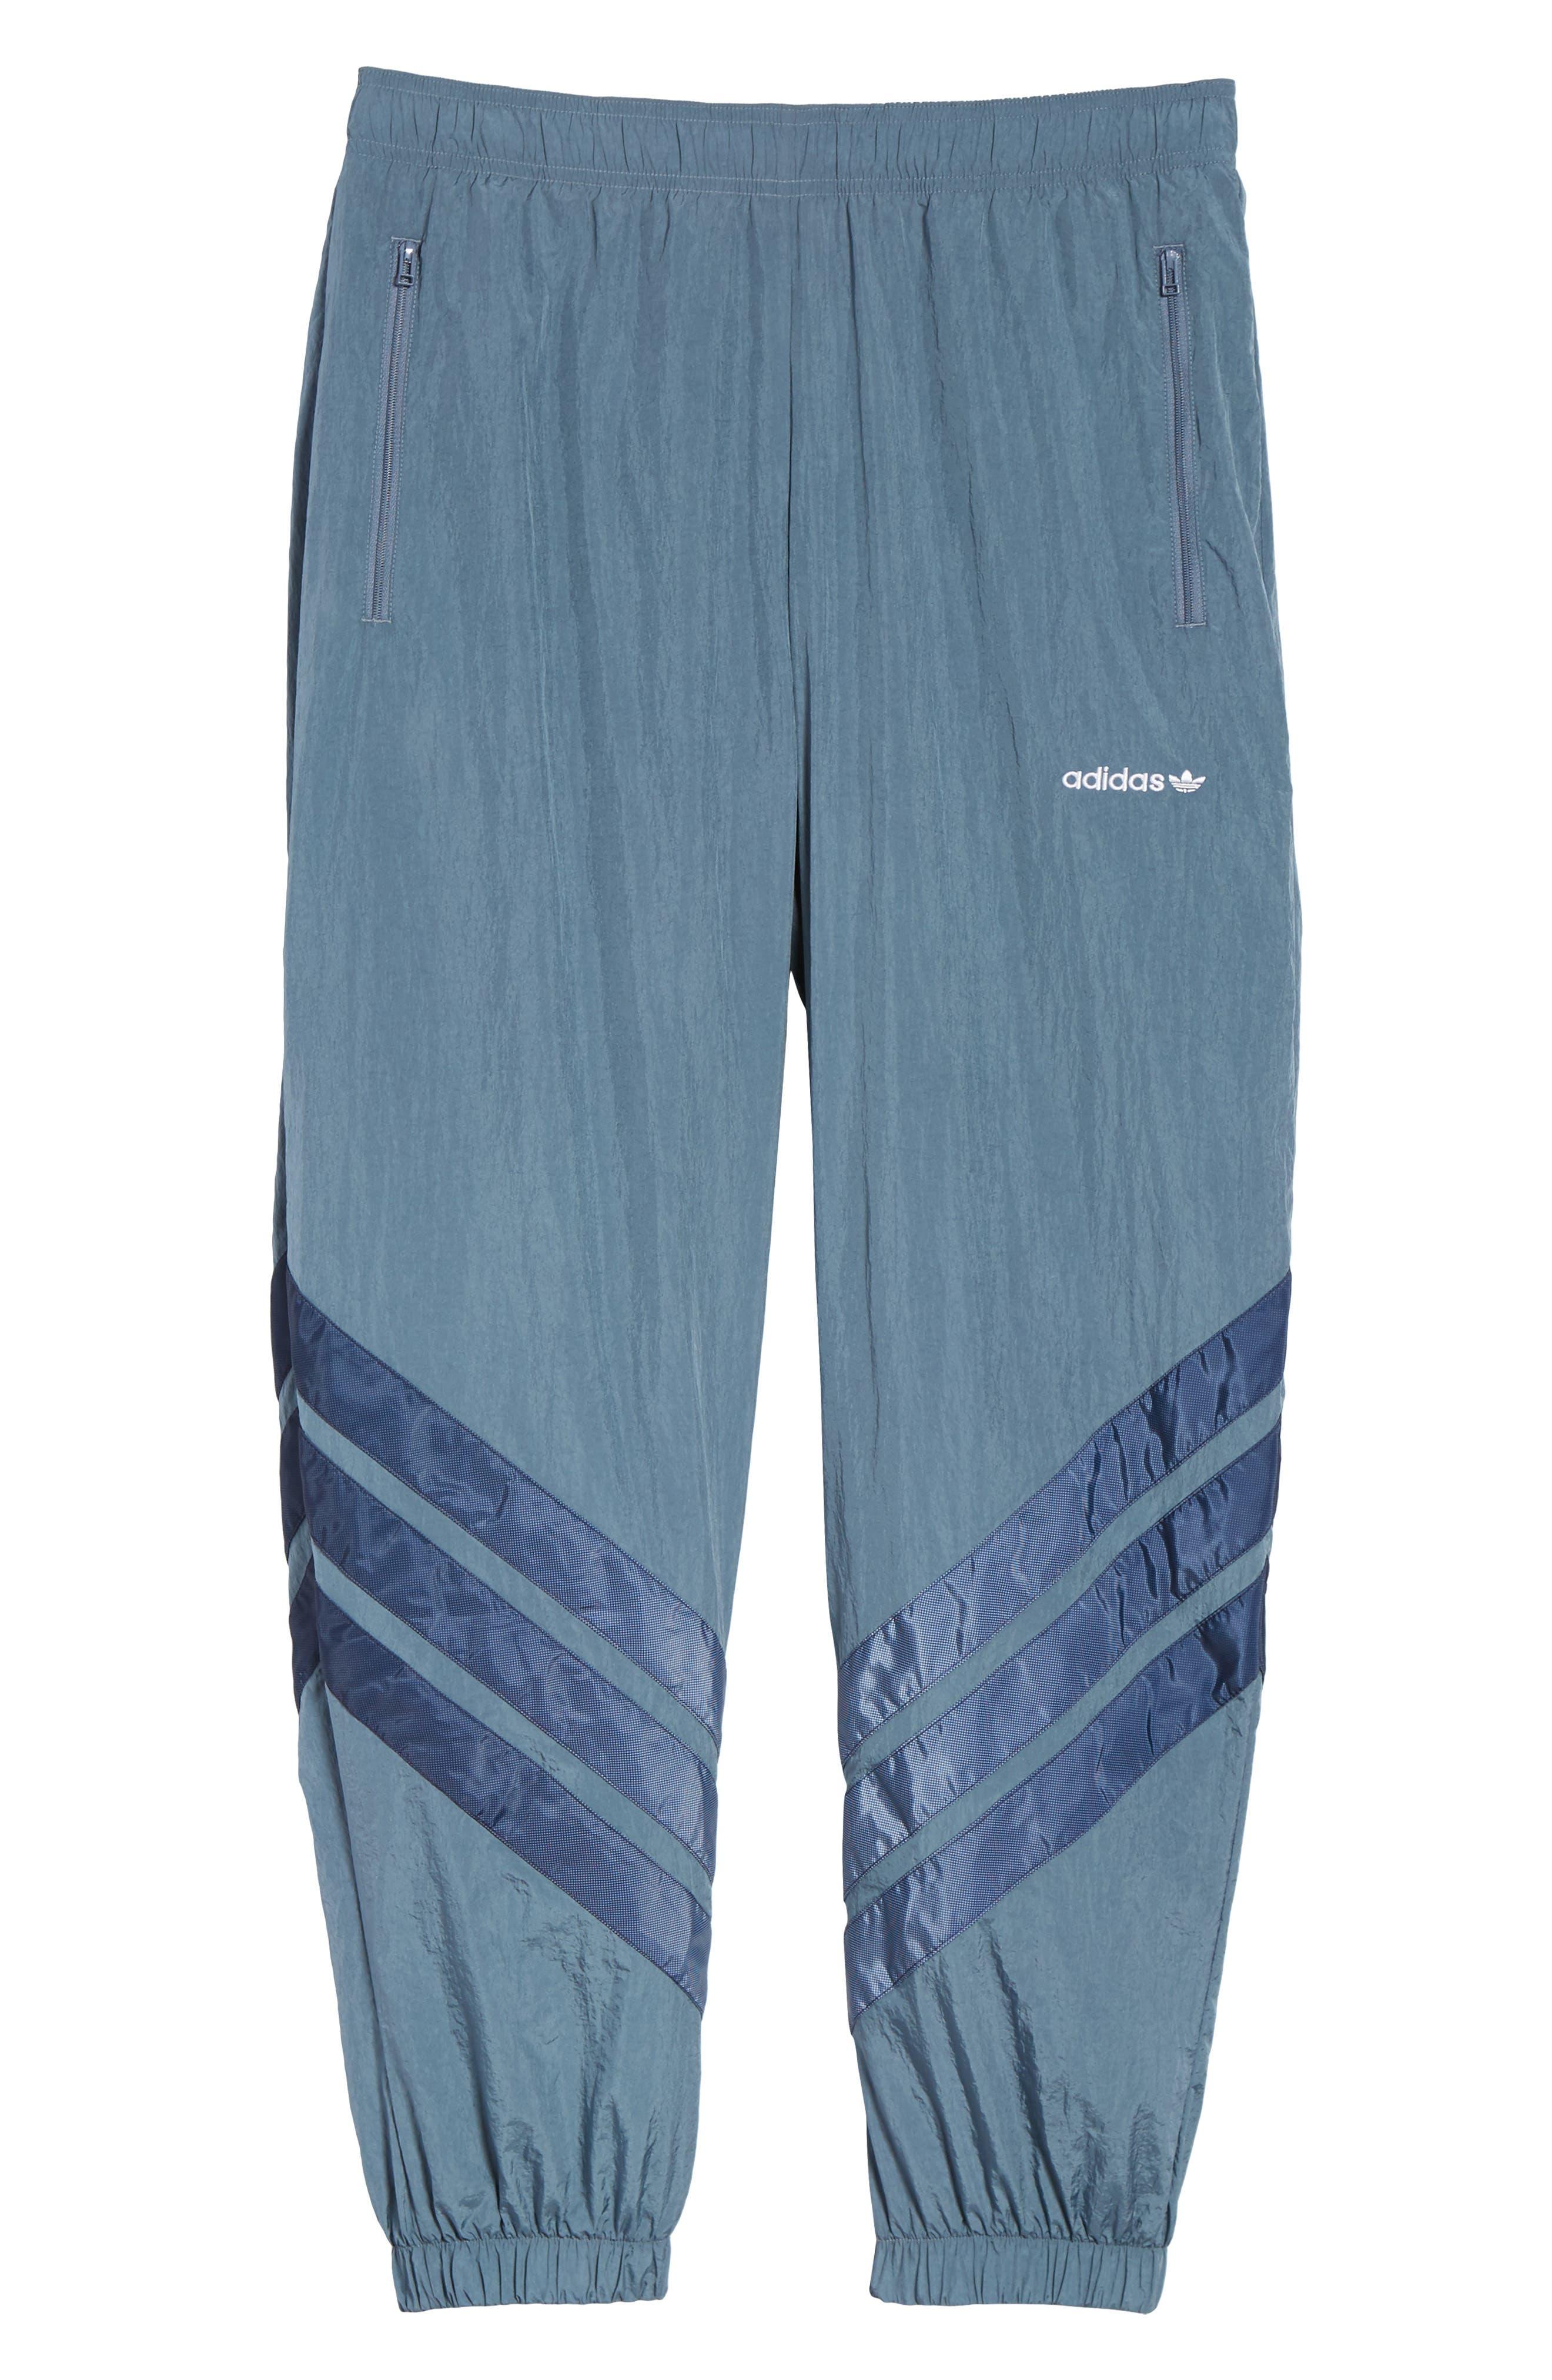 Originals V-Stripe Windpants,                             Alternate thumbnail 6, color,                             Raw Steel/ White